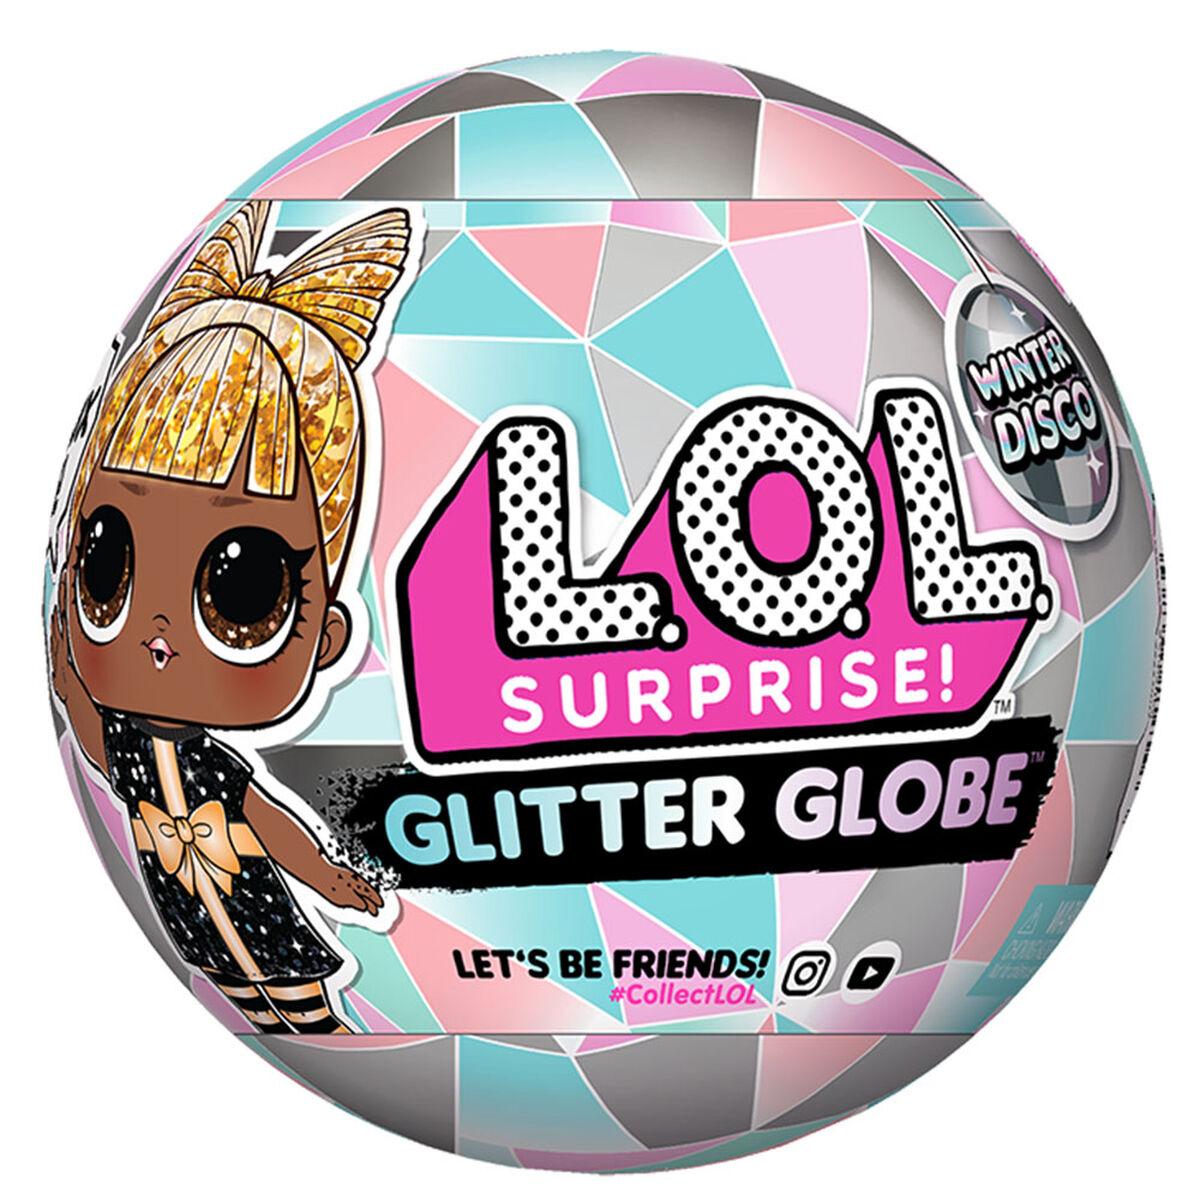 LOL Glitter Globe Winter Disco